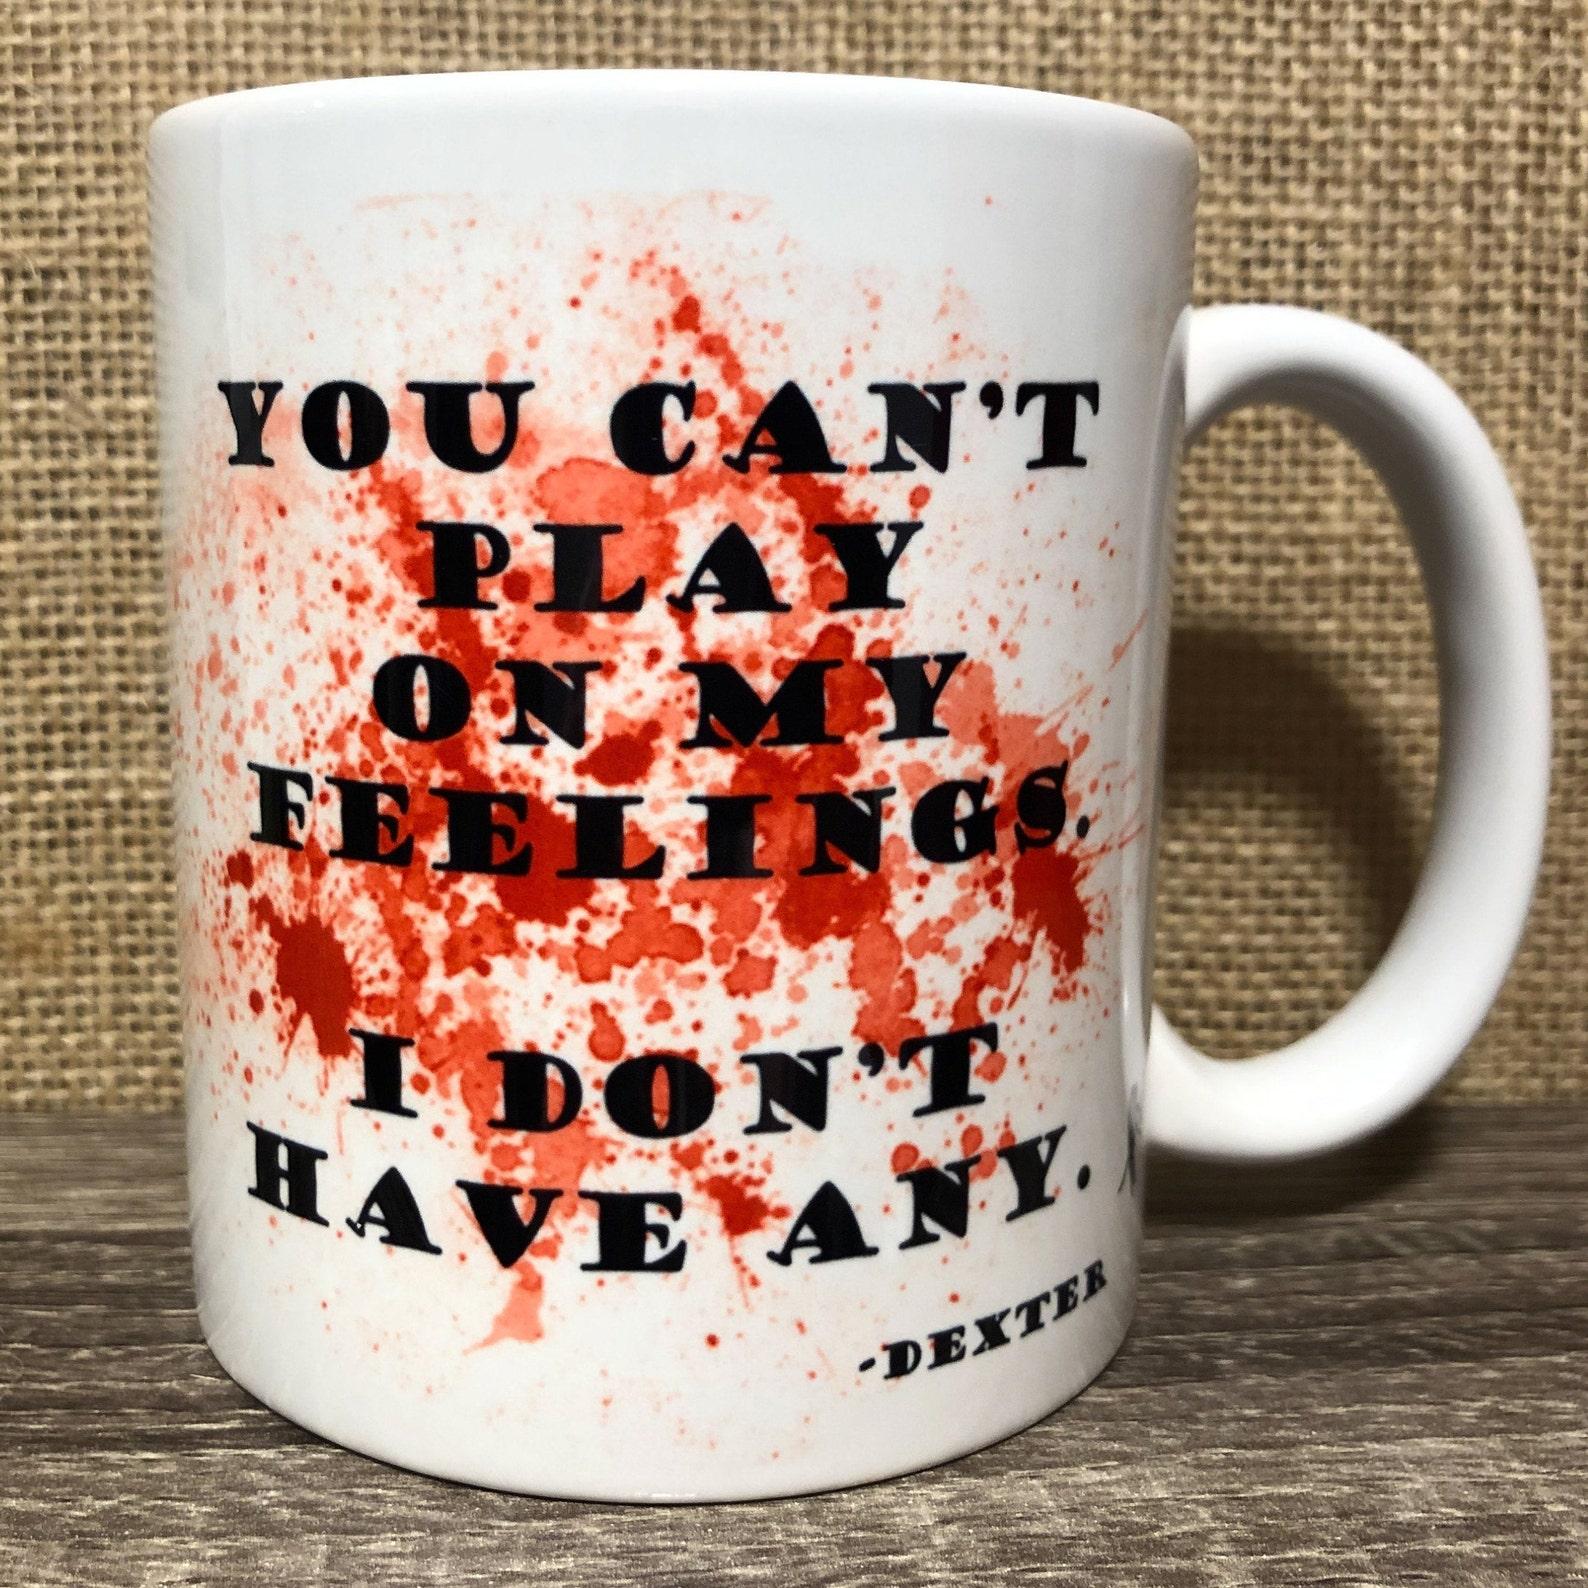 Dexter mug